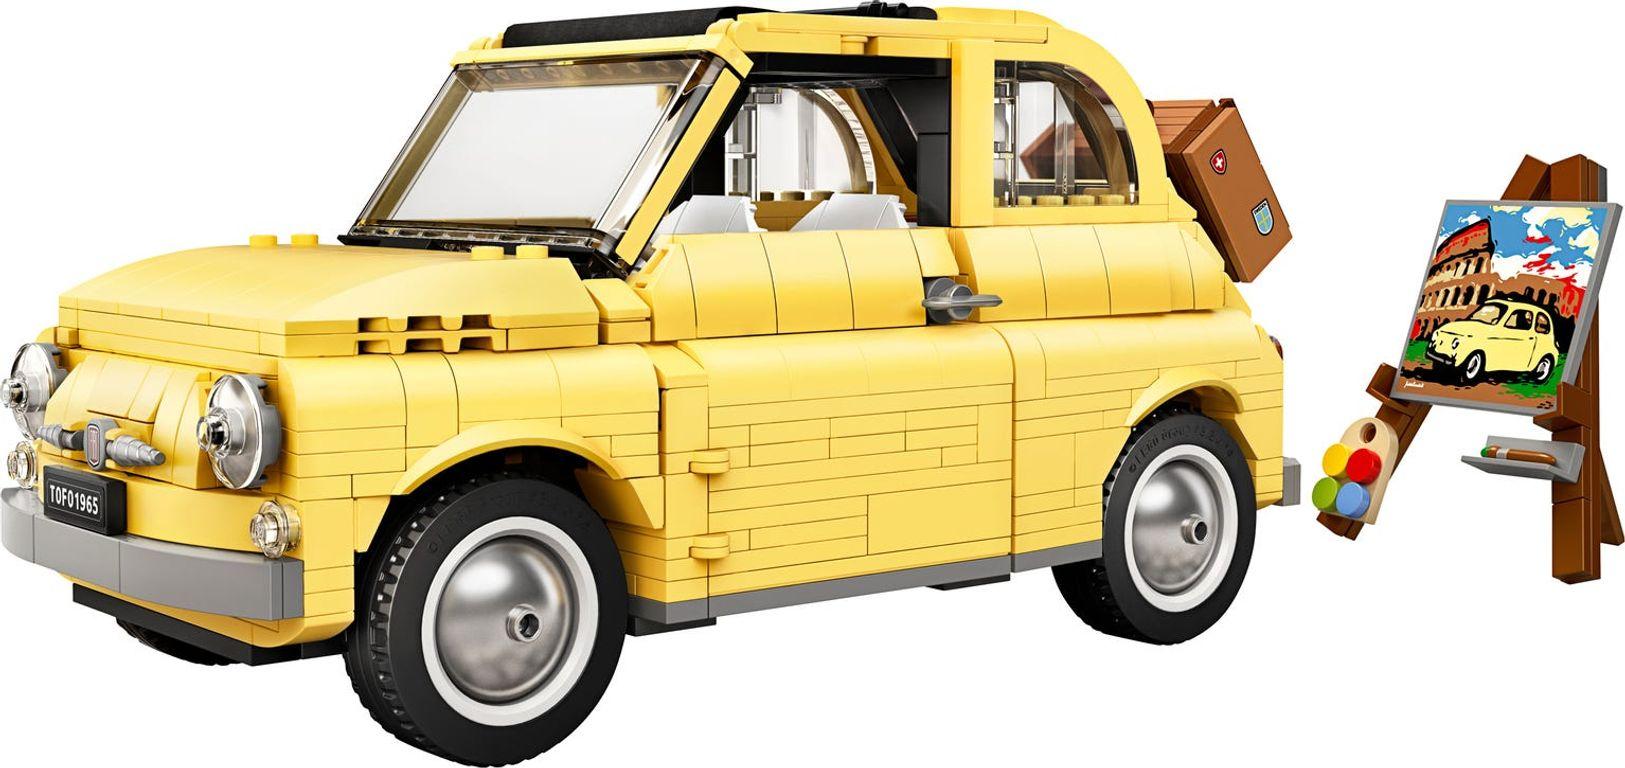 Fiat 500 components